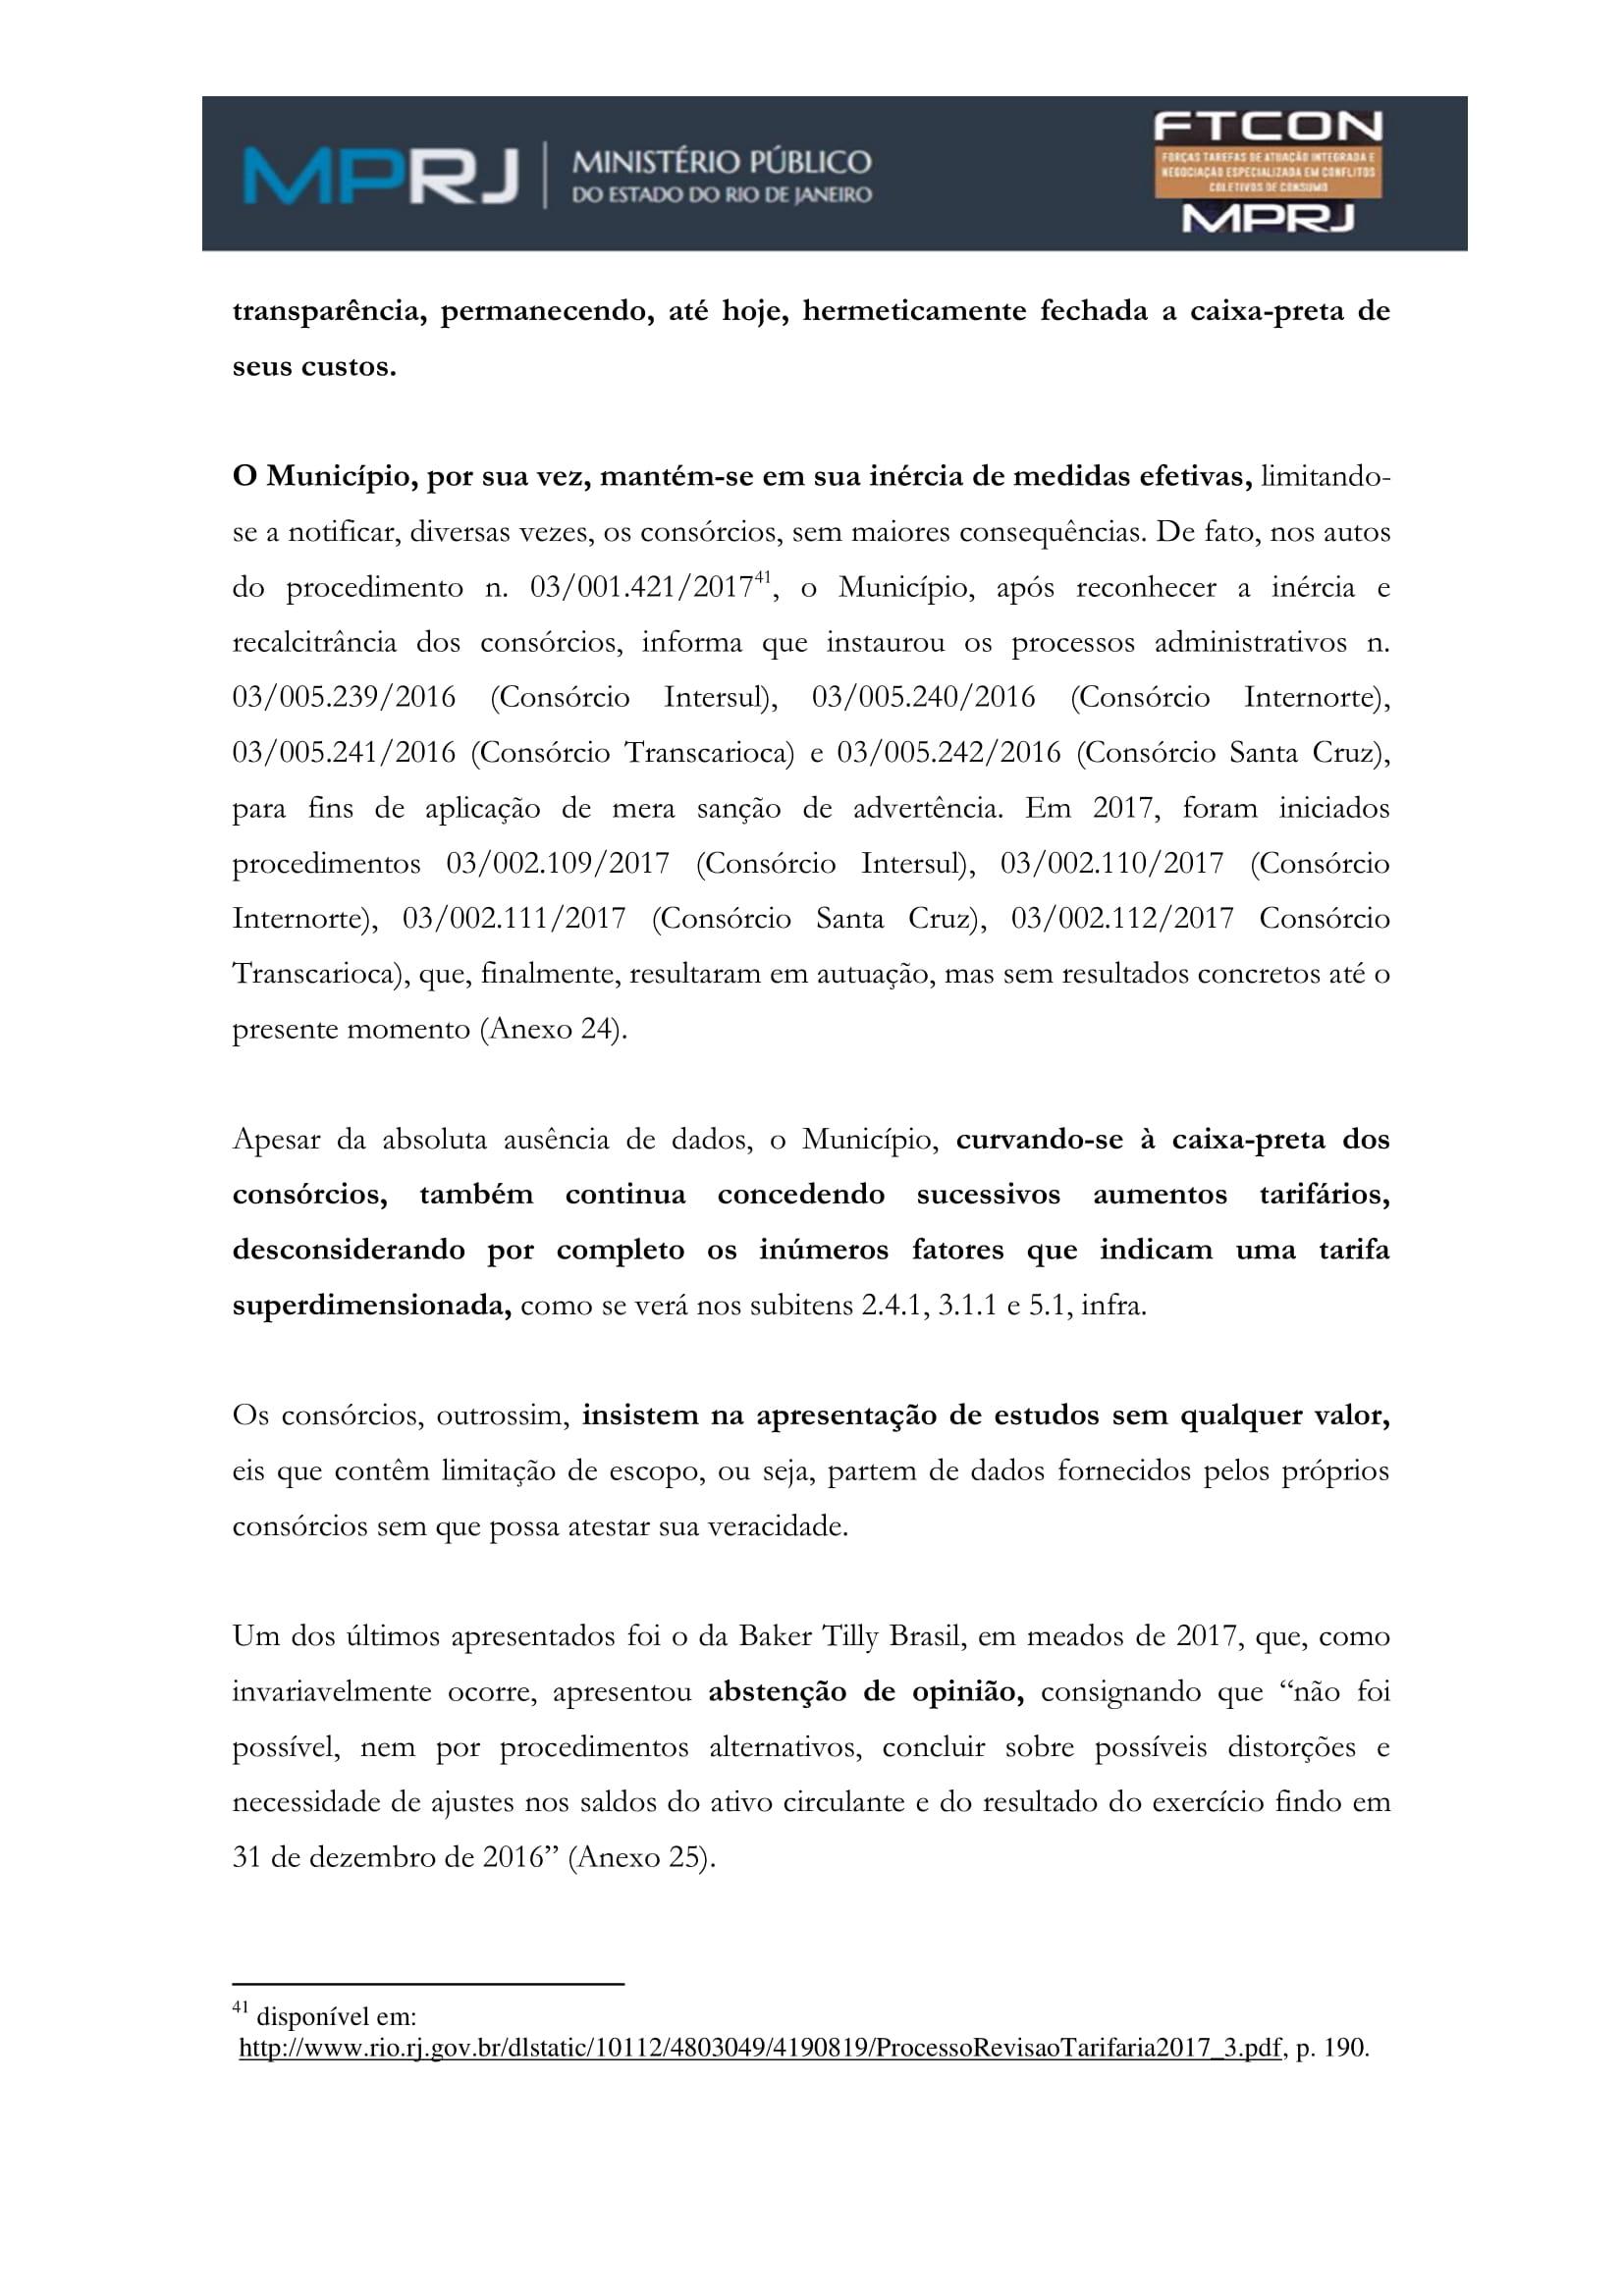 acp_caducidade_onibus_dr_rt-048